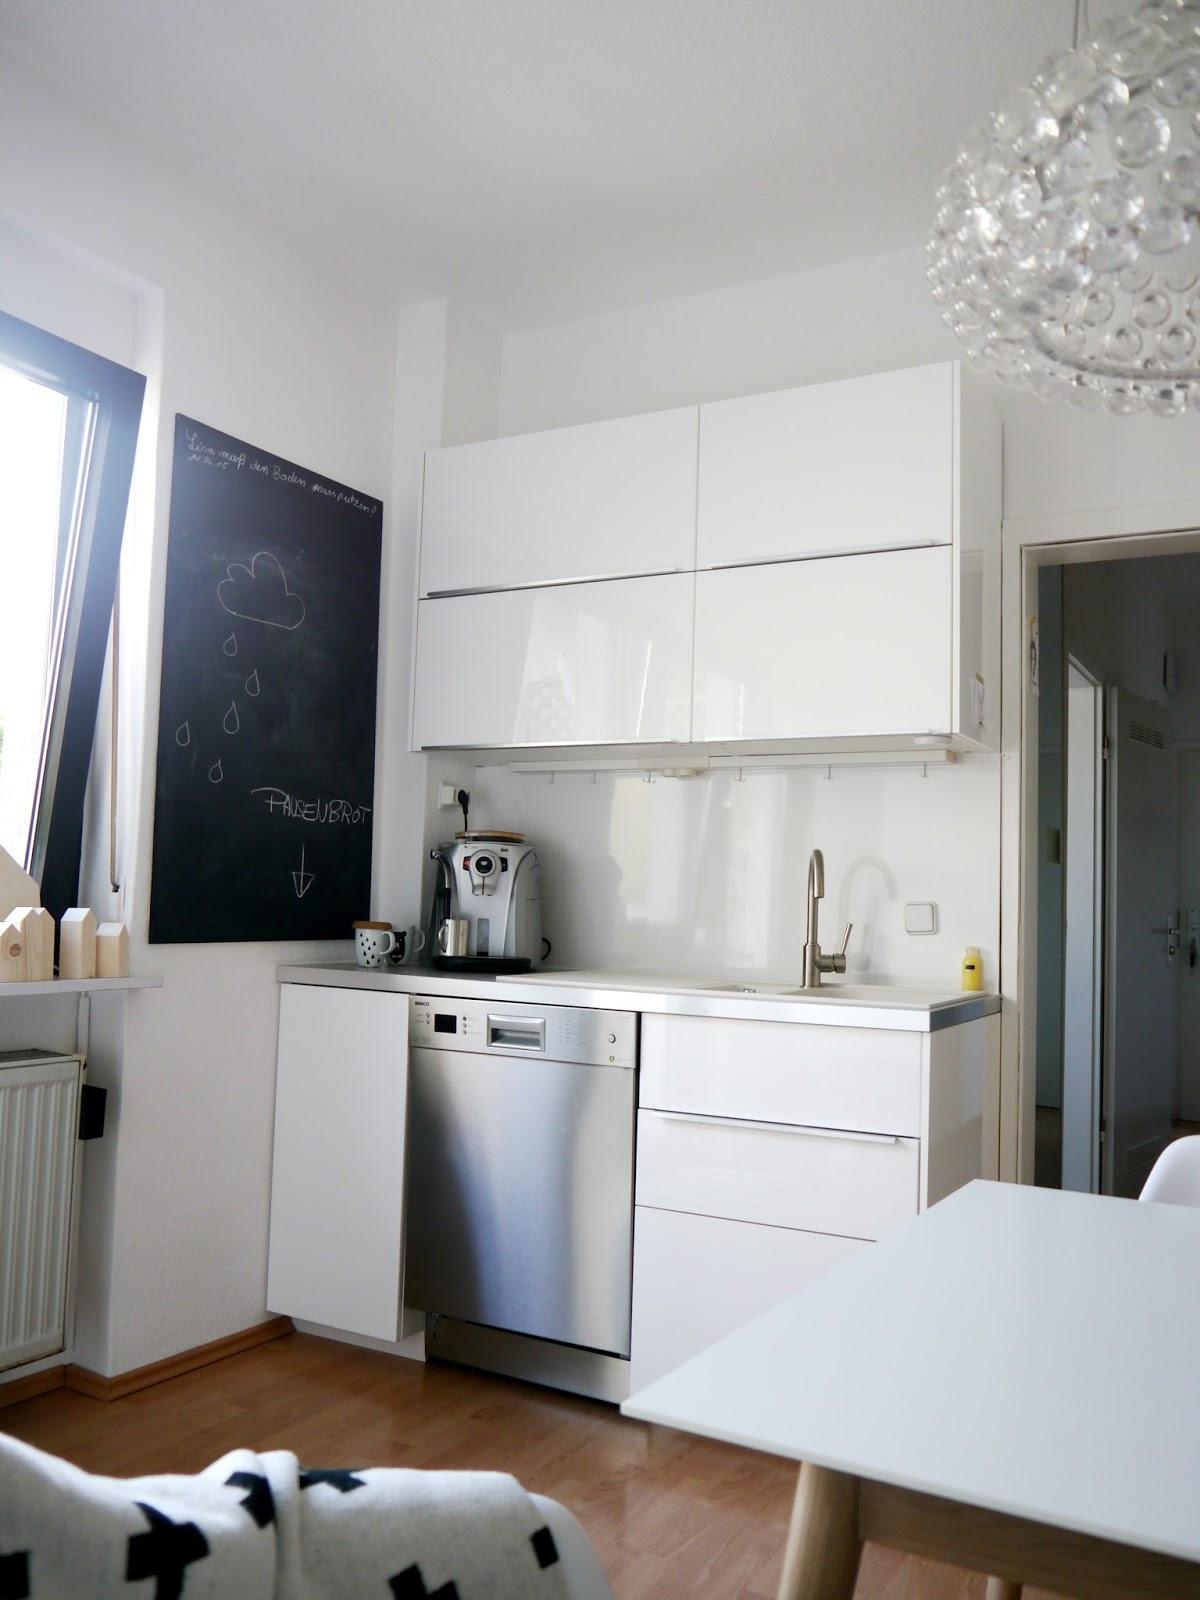 ideenpurzelb ume mein ikea k chentest. Black Bedroom Furniture Sets. Home Design Ideas